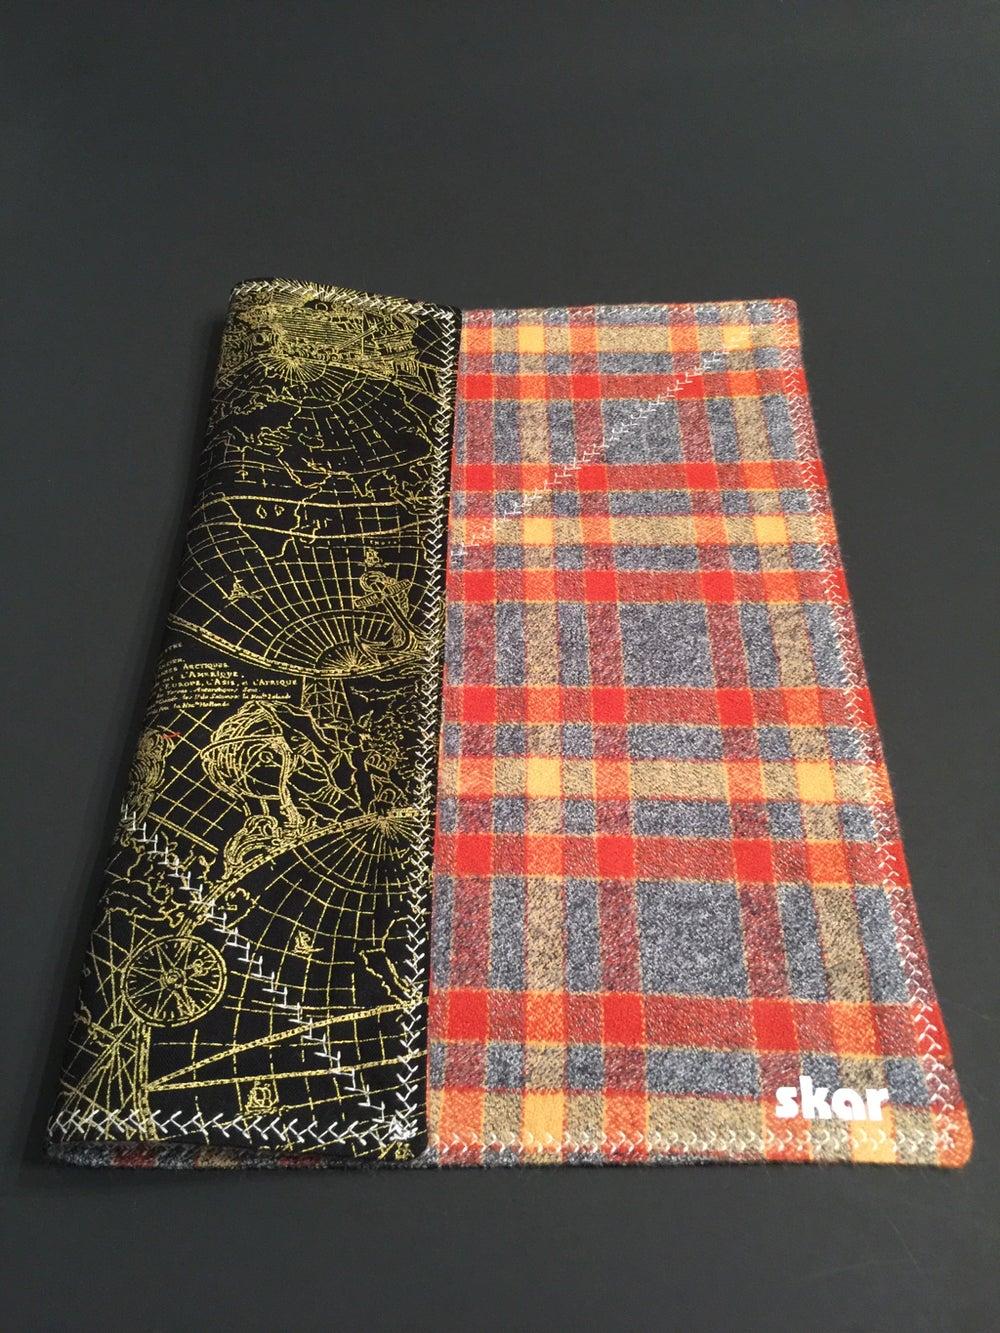 Image of Grey/Orange flannel with dark maps